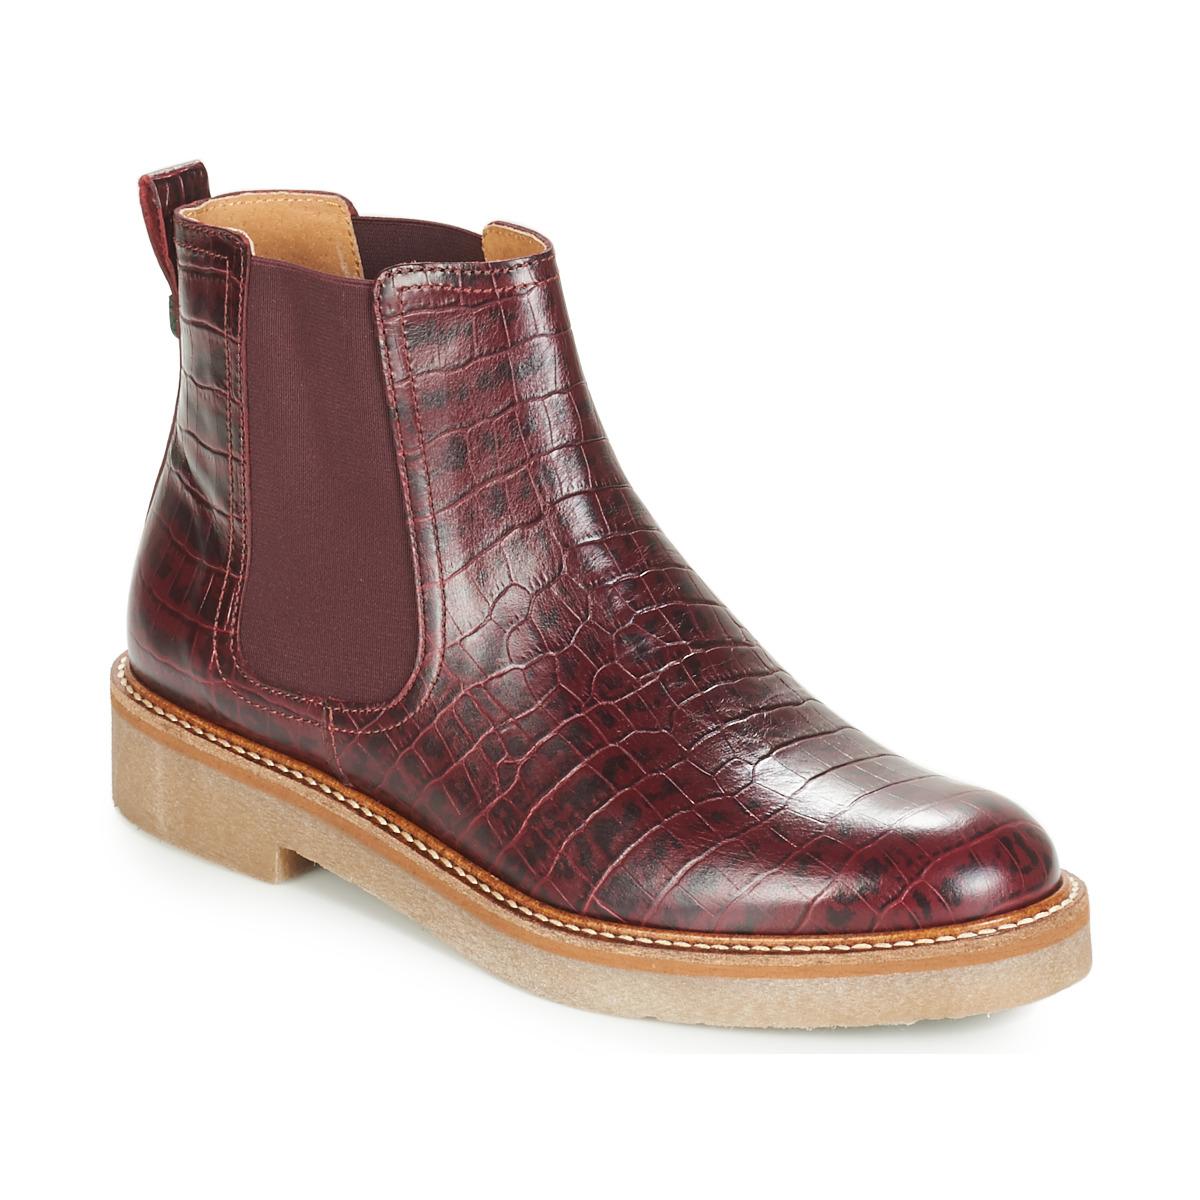 Kickers OXFORDCHIC Bordeaux - Kostenloser Versand bei Spartoode ! - Schuhe Boots Damen 139,00 €